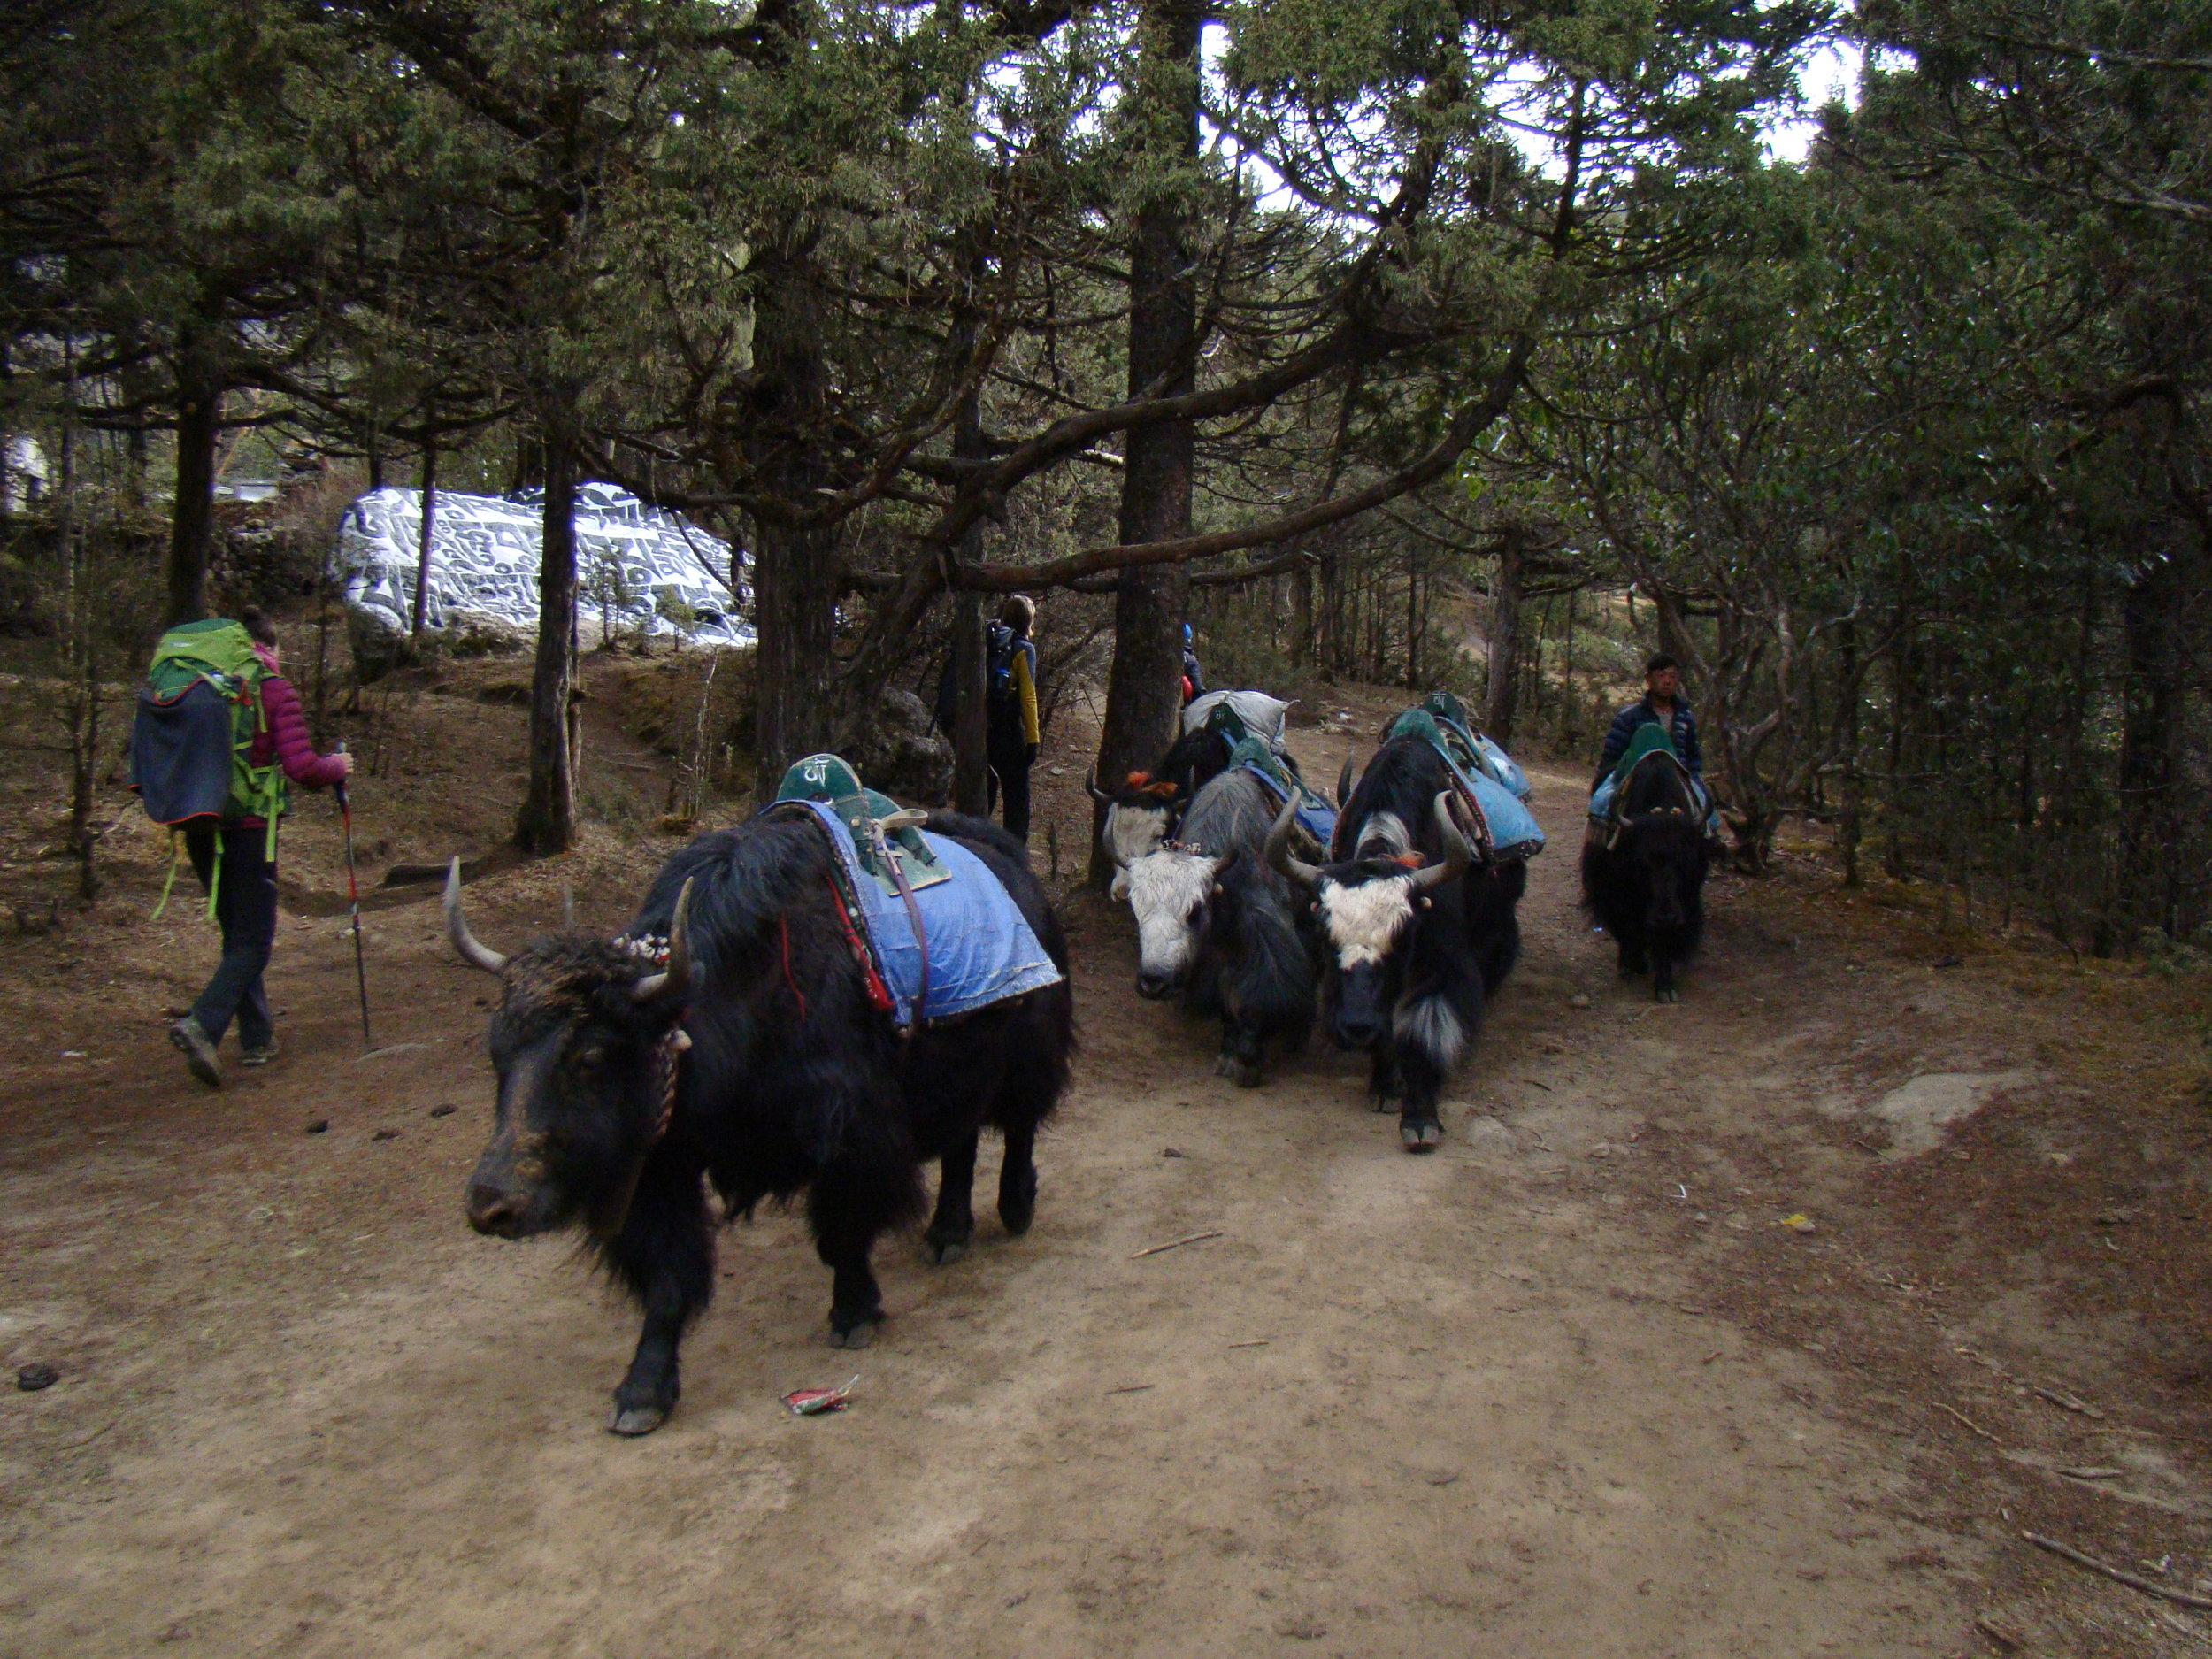 Yaks walking in pine forest in Pangboche - Photo by Filip Lhota